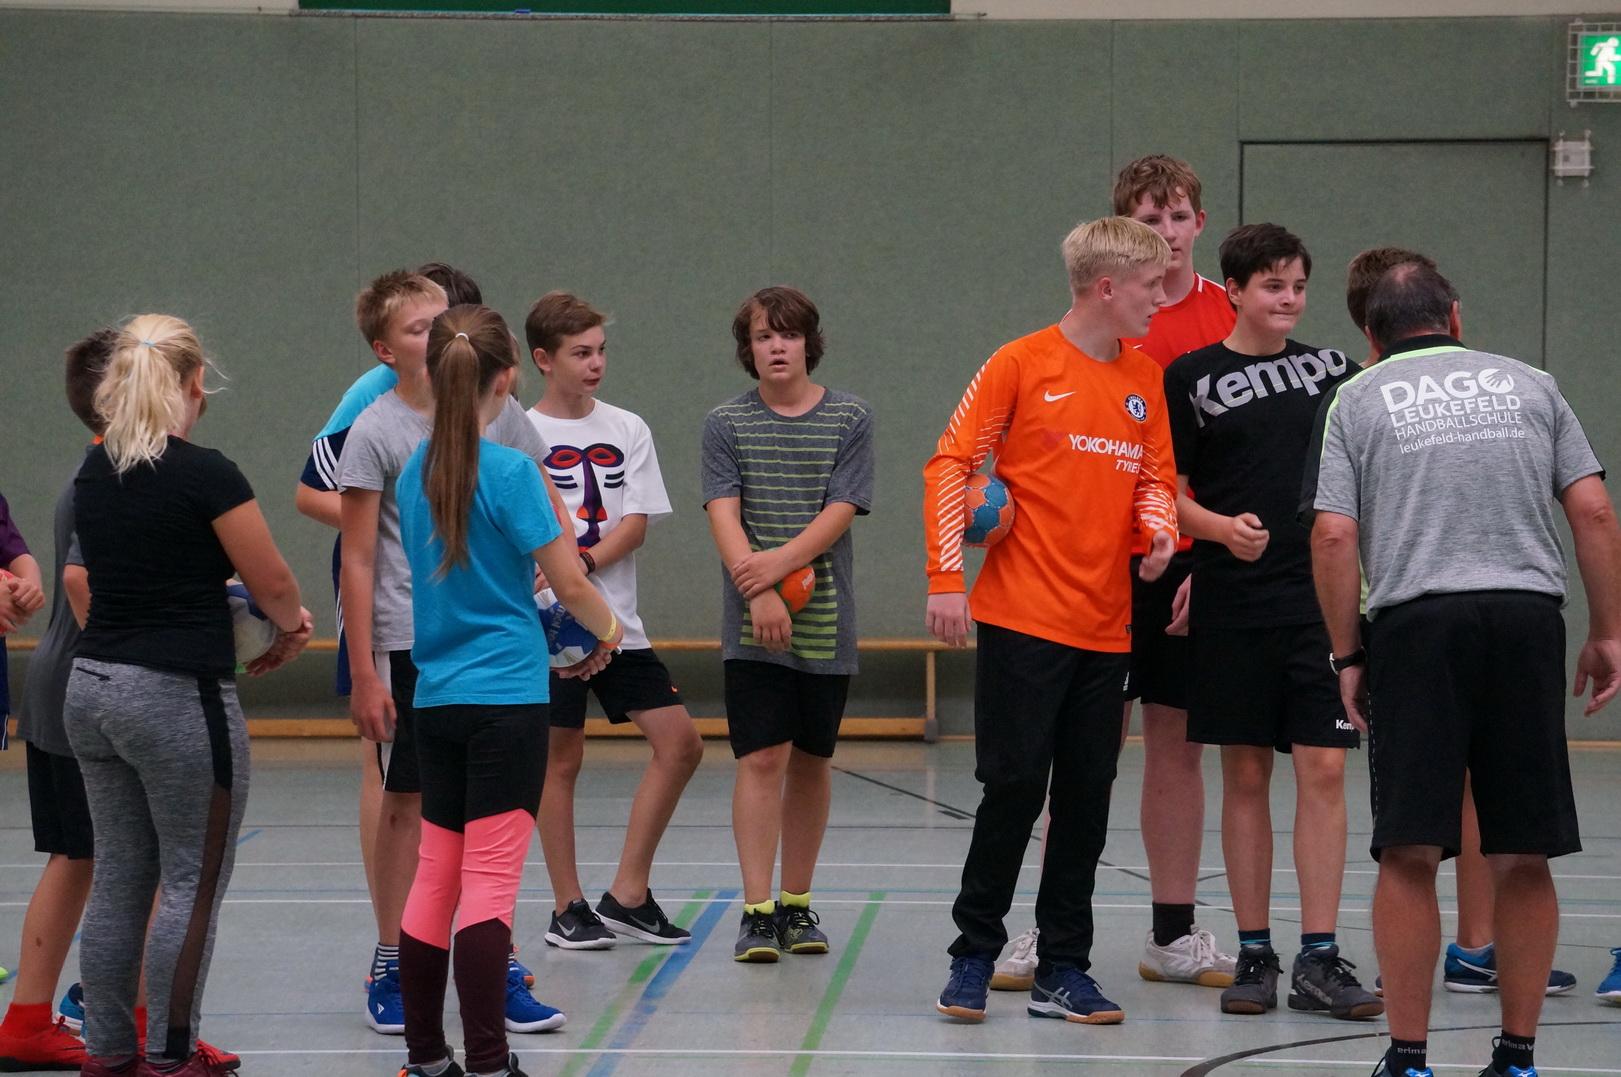 201808_Handballcamp_SDH_MG_041w